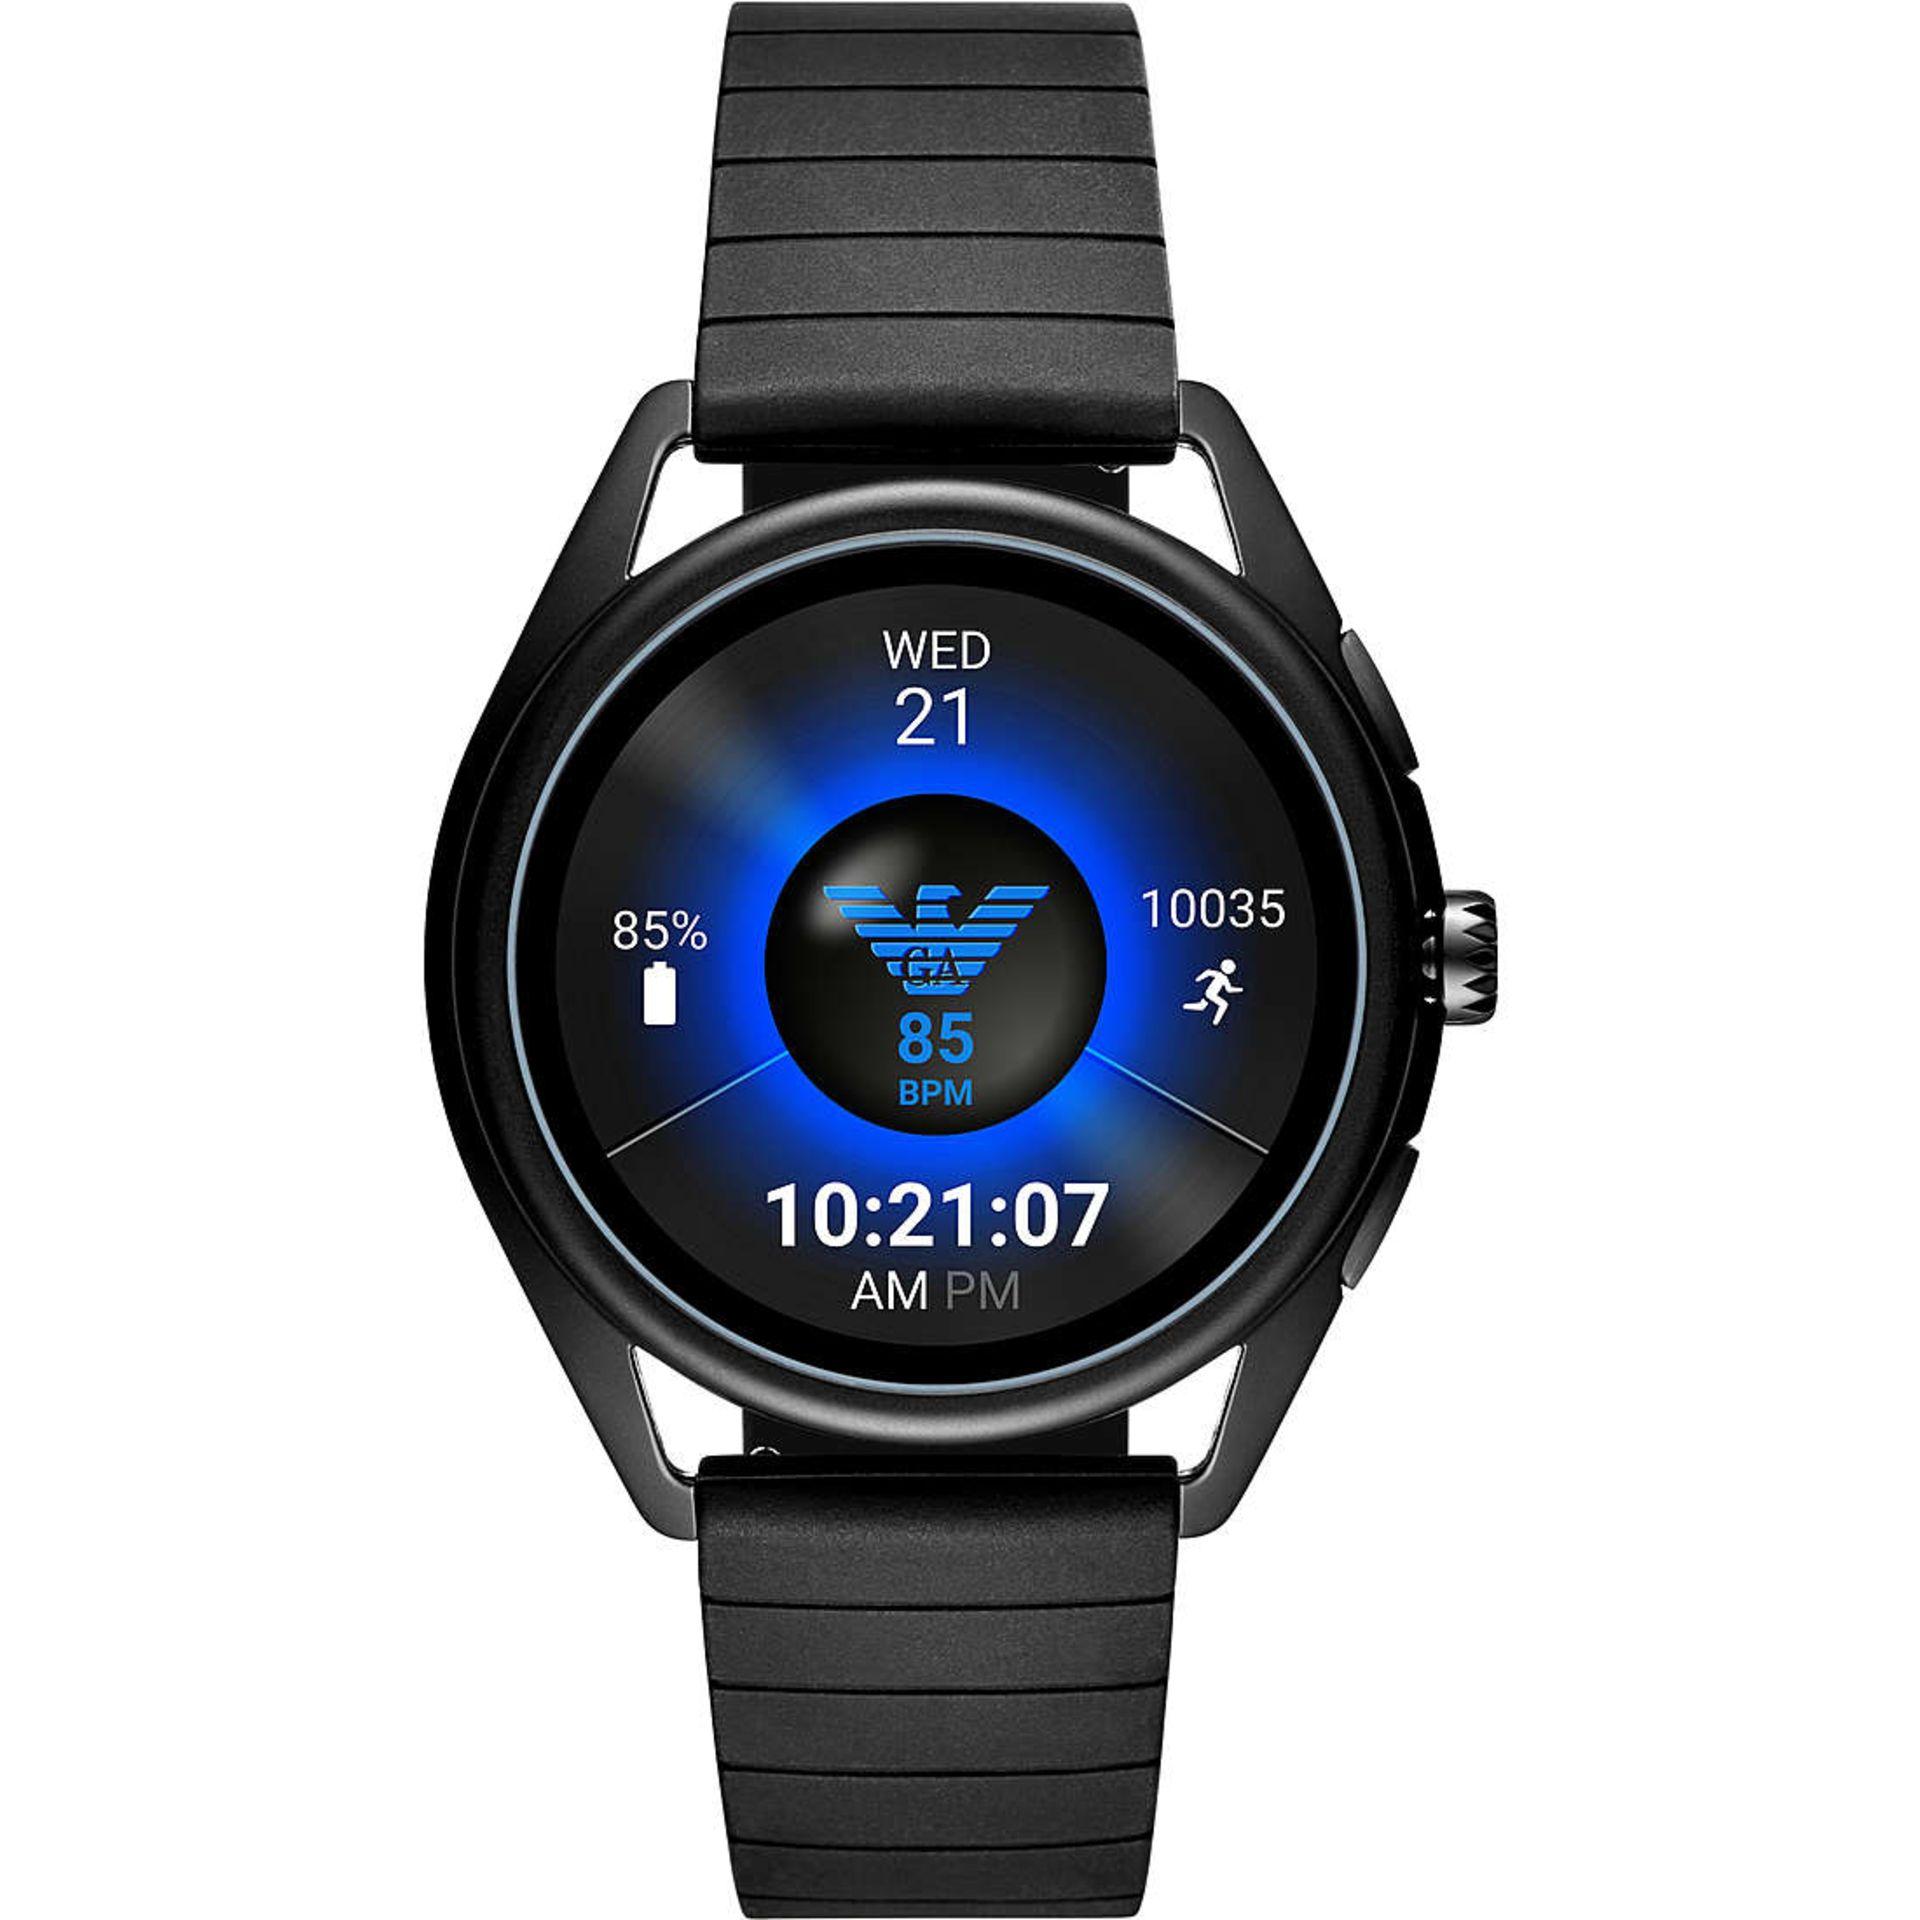 Emporio Armani Men's Smart Watch ART5017 - Image 2 of 2